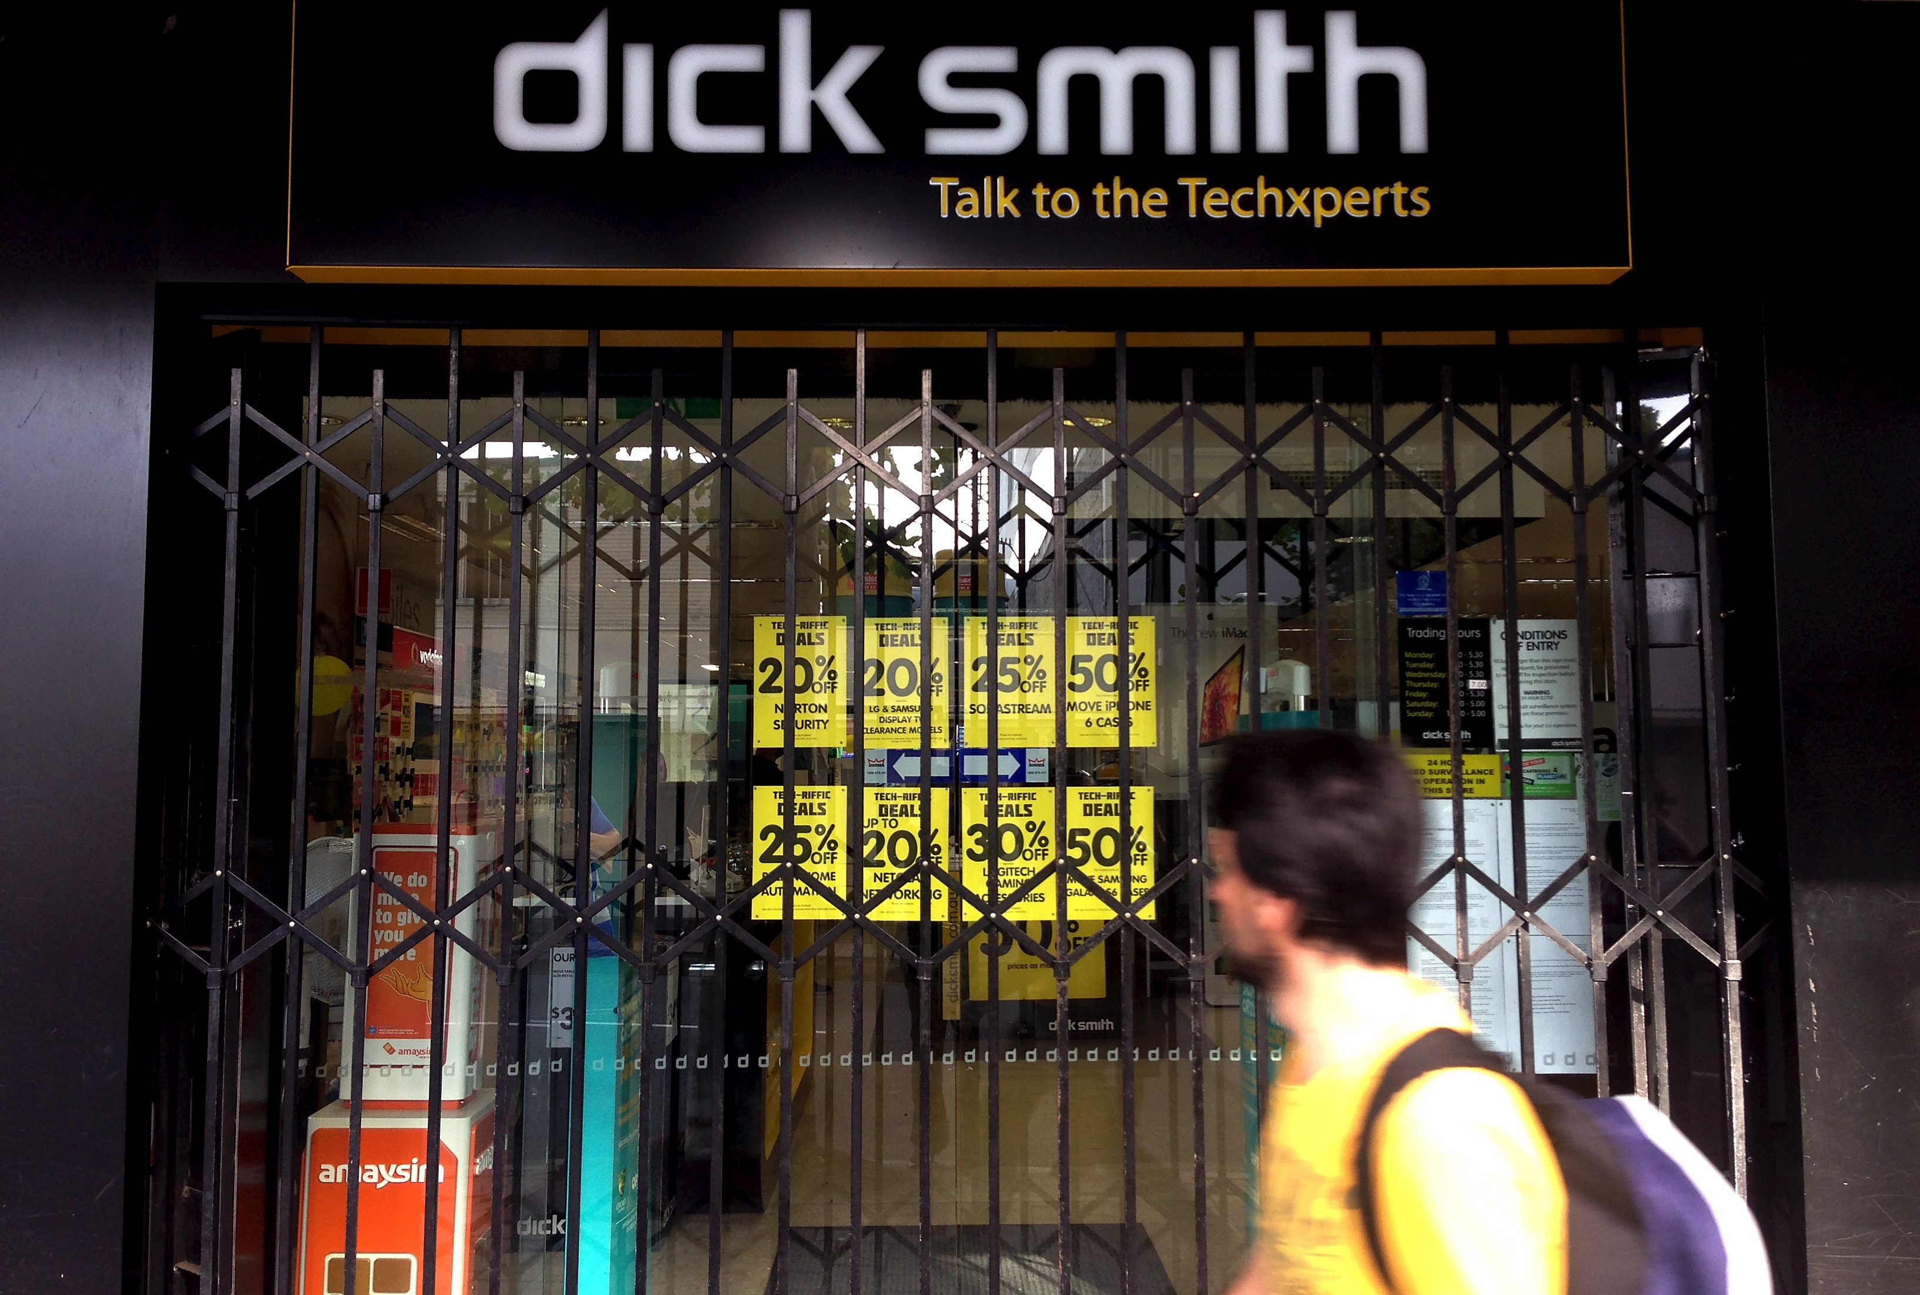 Du lphone dick smith electronics